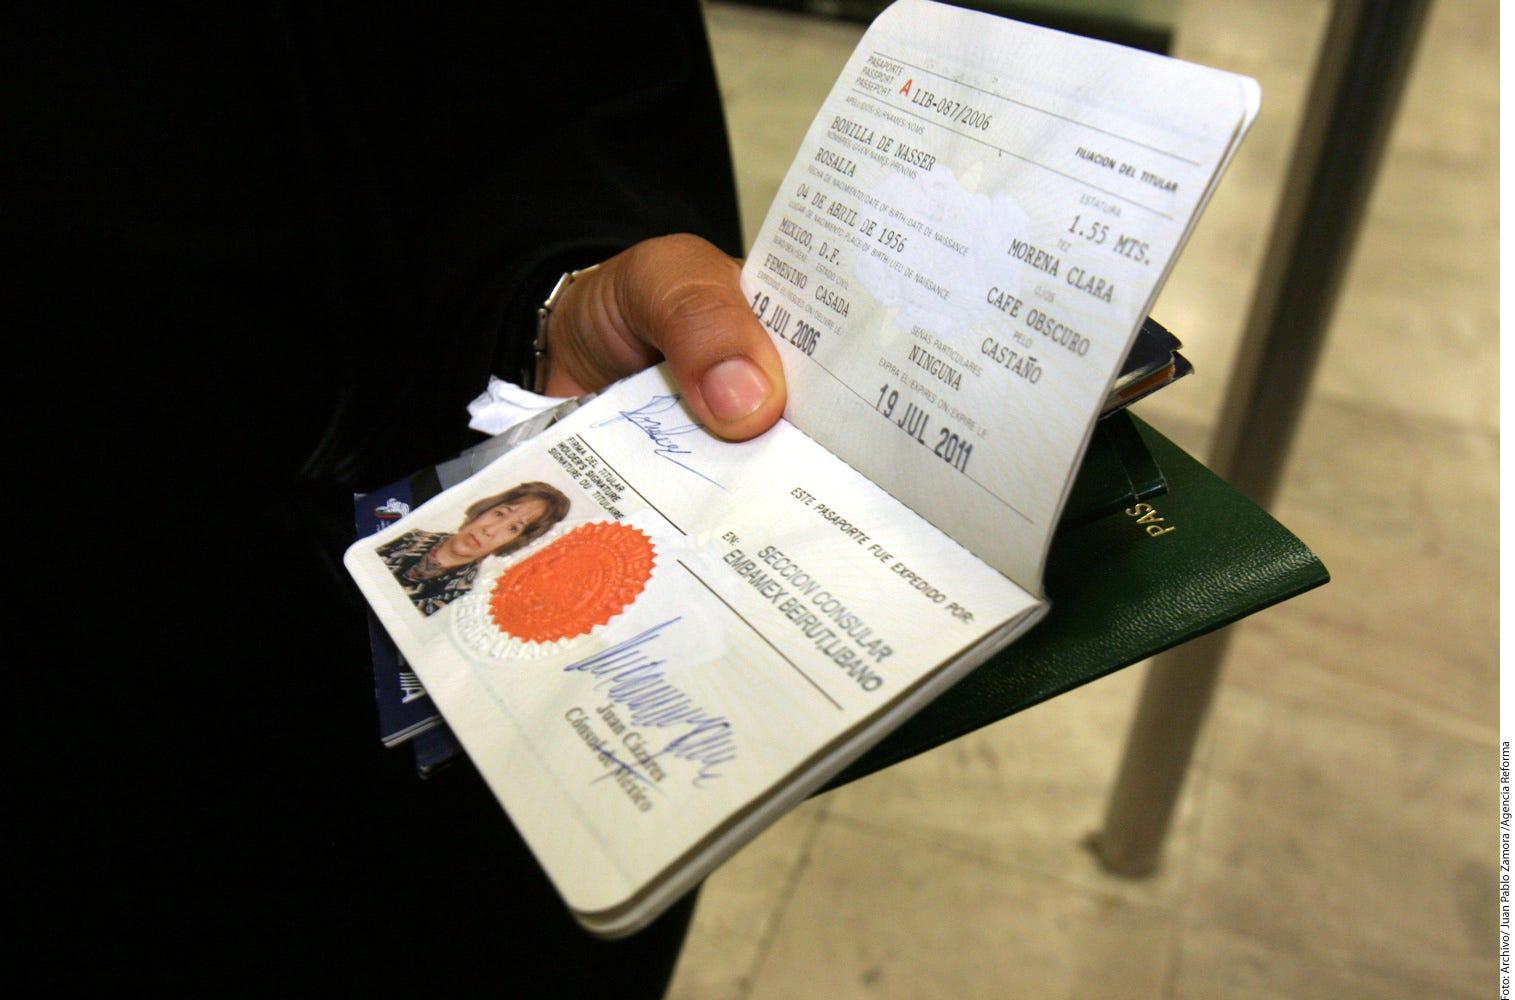 renovacion de pasaporte americano online dating